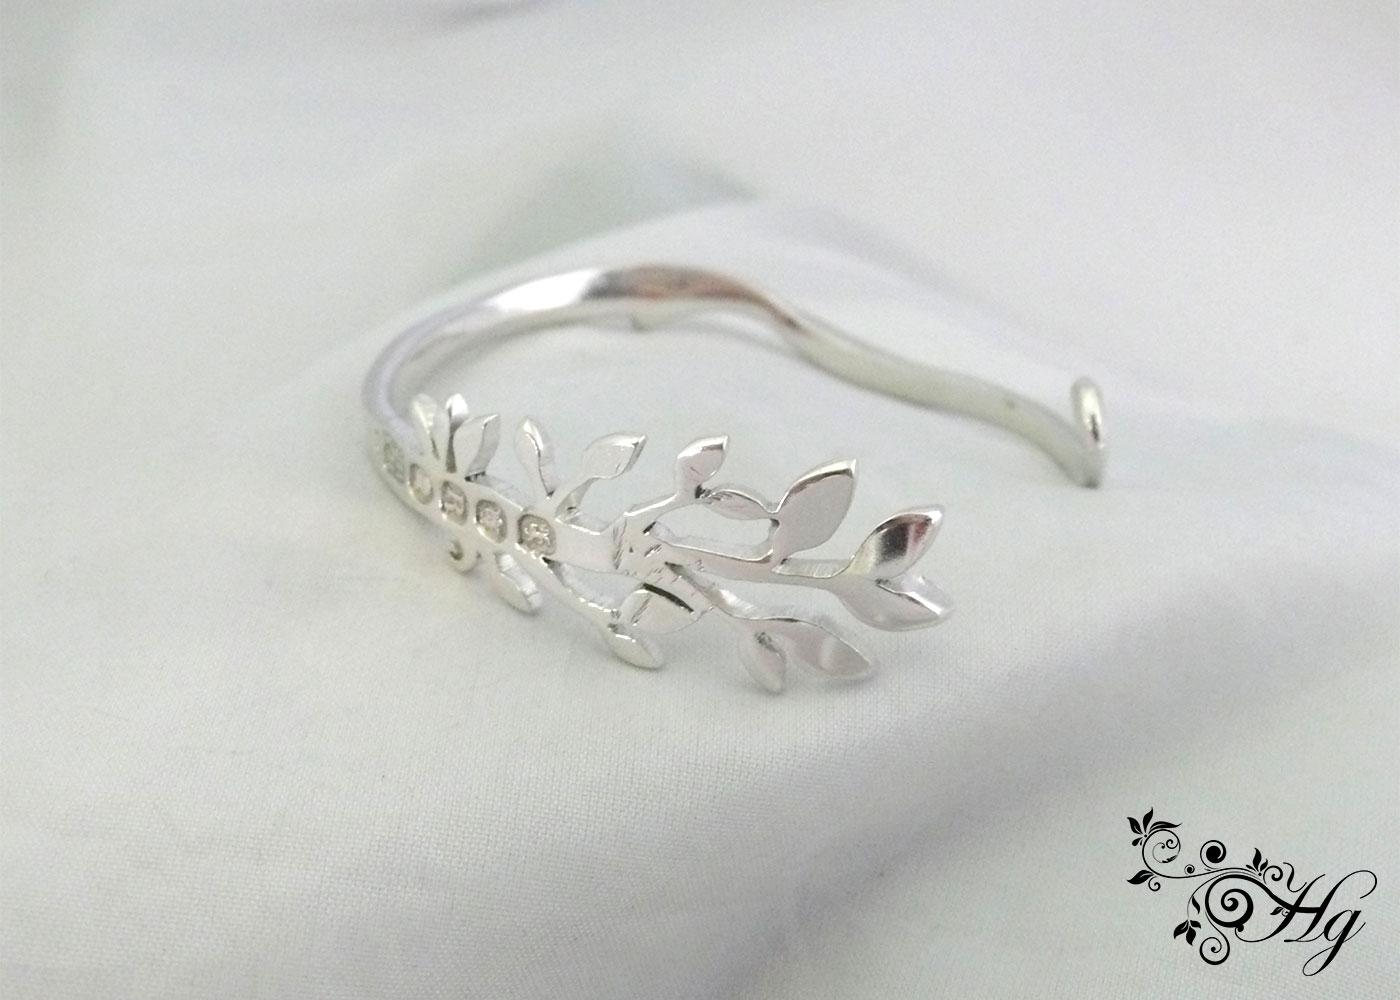 handmade victorian sterling silver fork - green leaves bracelet